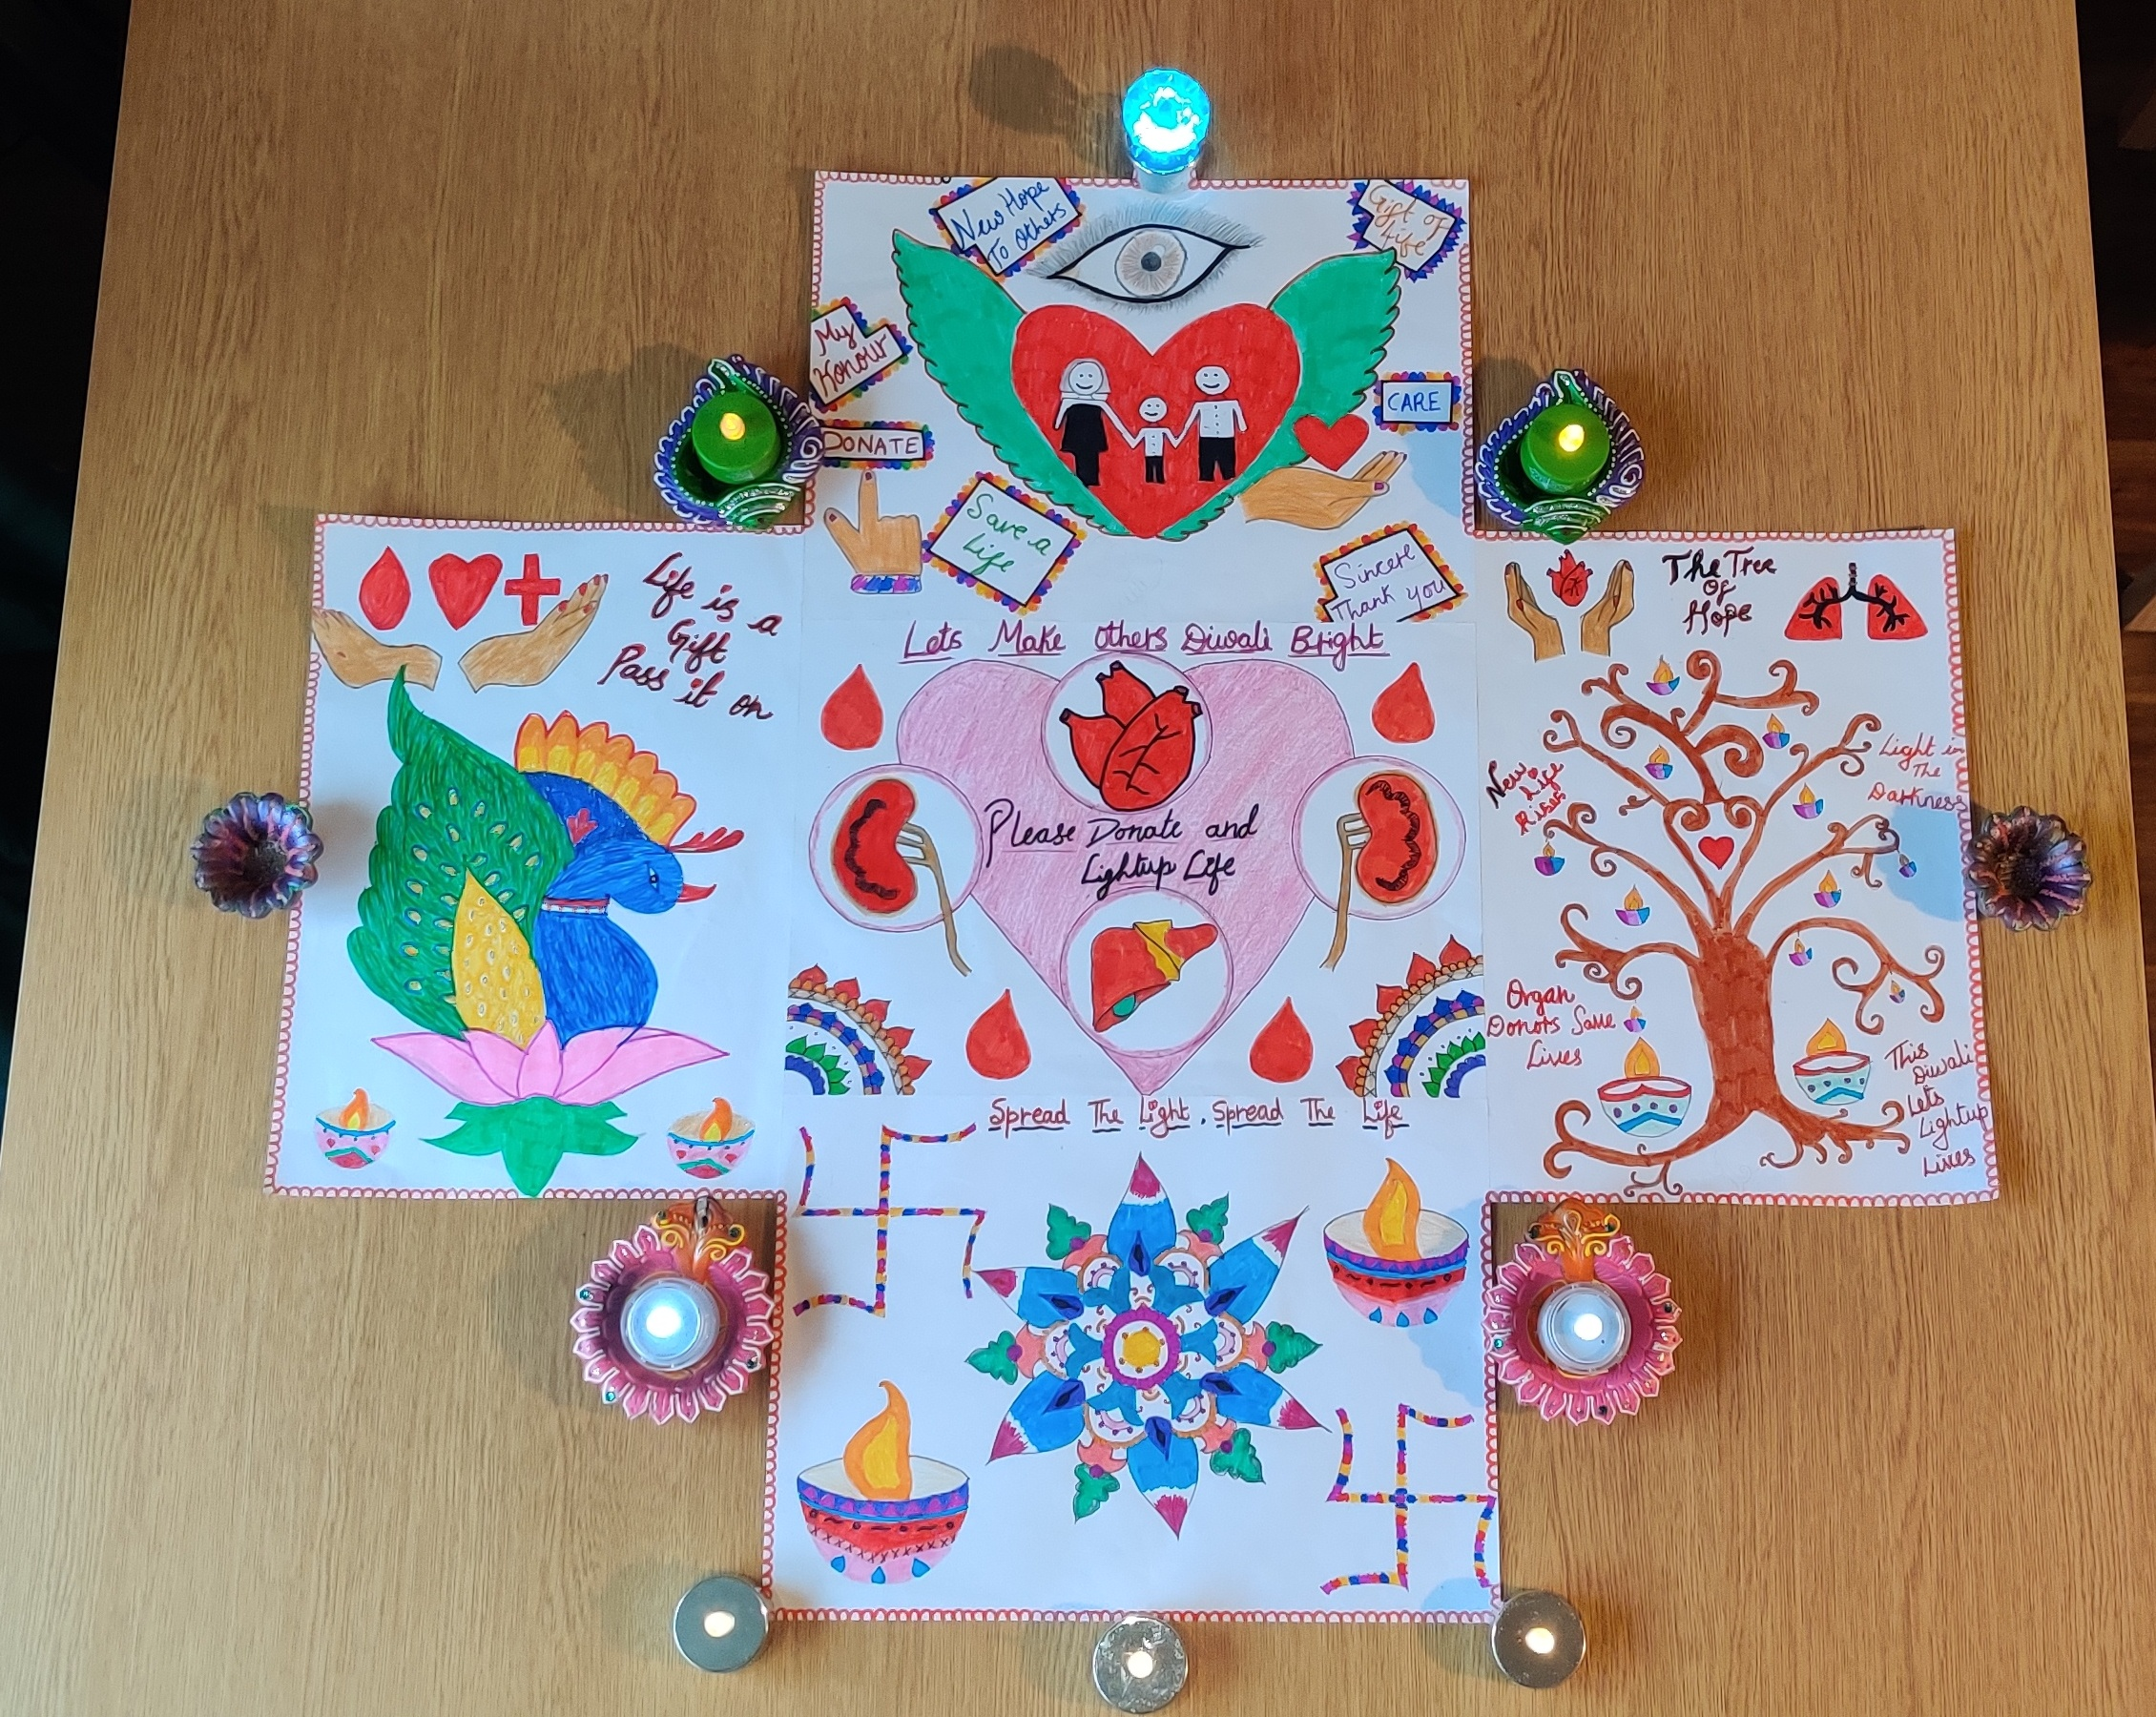 Prisha's artwork with candles around it